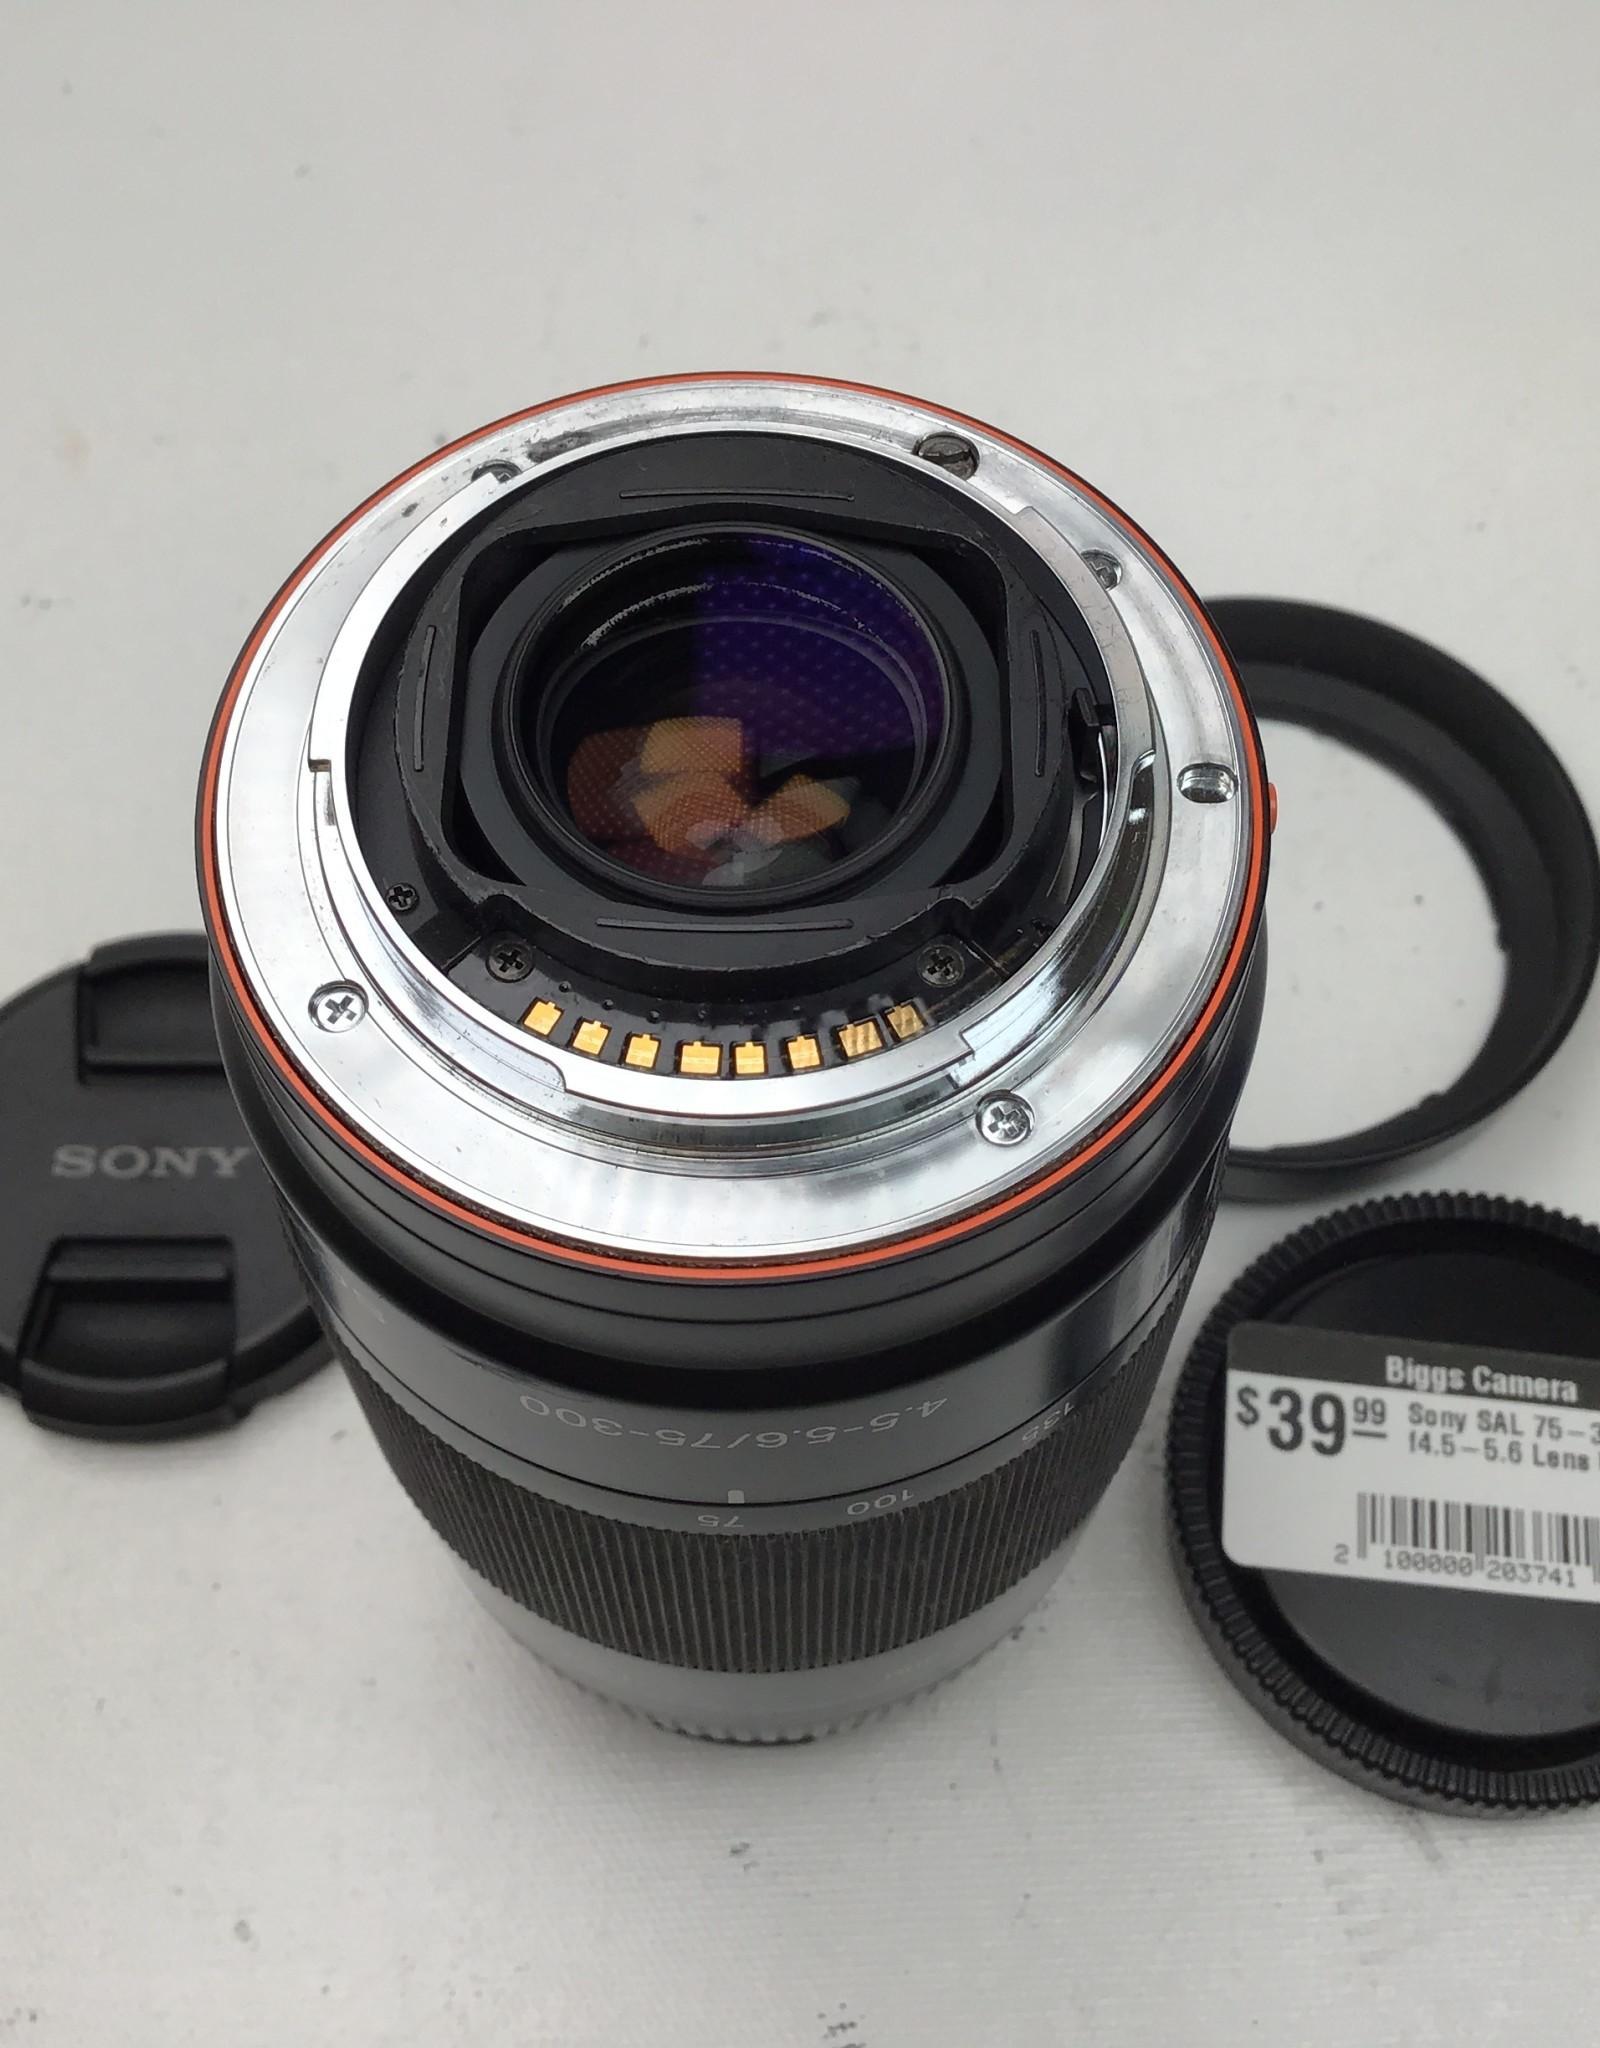 SONY Sony SAL 75-300mm f4.5-5.6 Lens Used Ugly